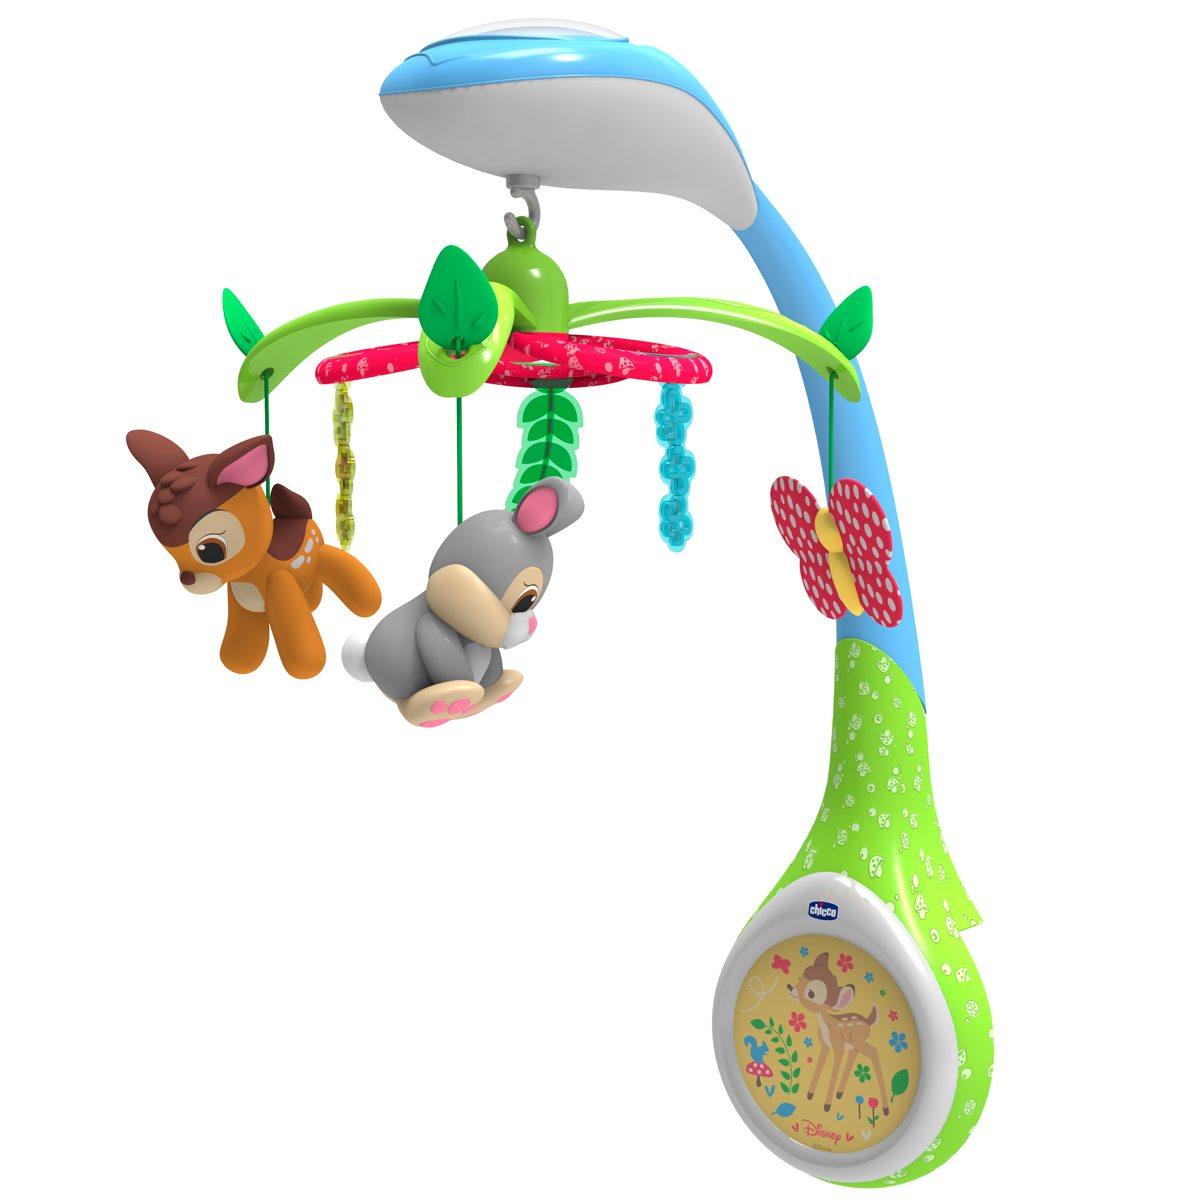 Chicco Игрушка-проектор для кроватки Бемби мобили chicco игрушка проектор для кроватки бемби